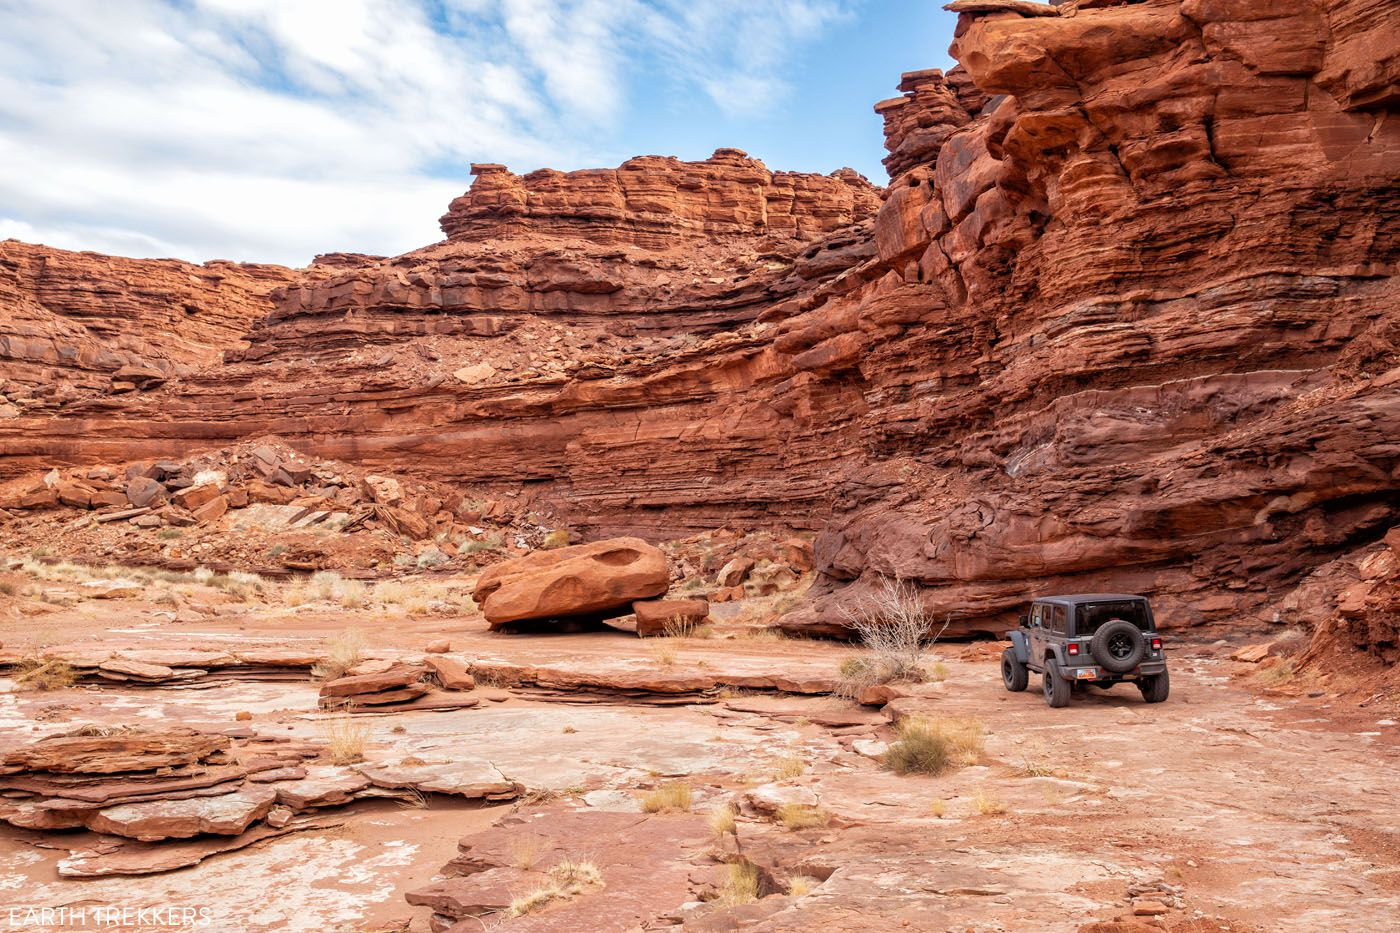 Lathrop Canyon